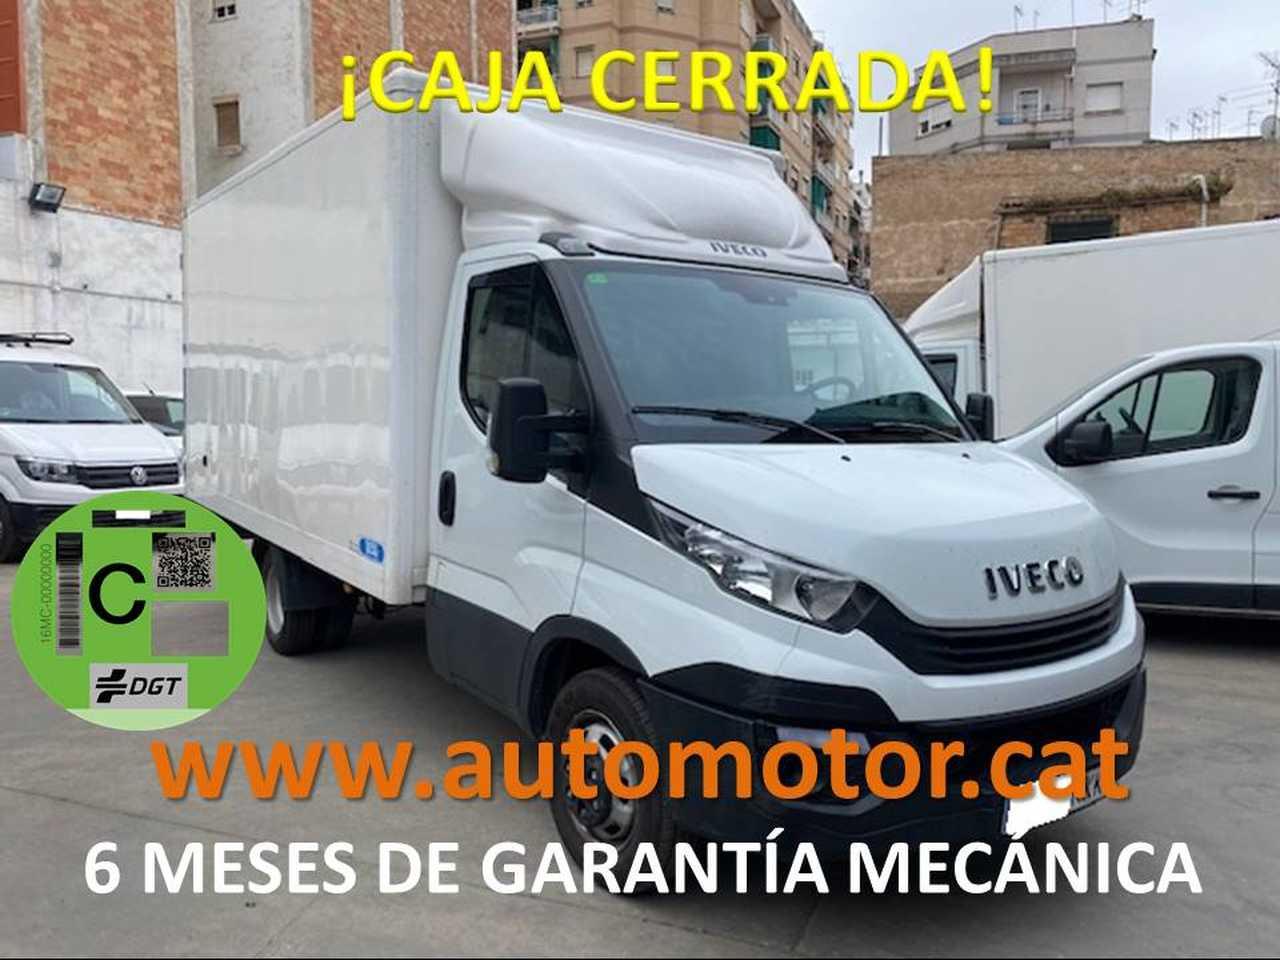 Iveco Daily Furgón 35C14 - GARANTIA MECANICA  - Foto 1